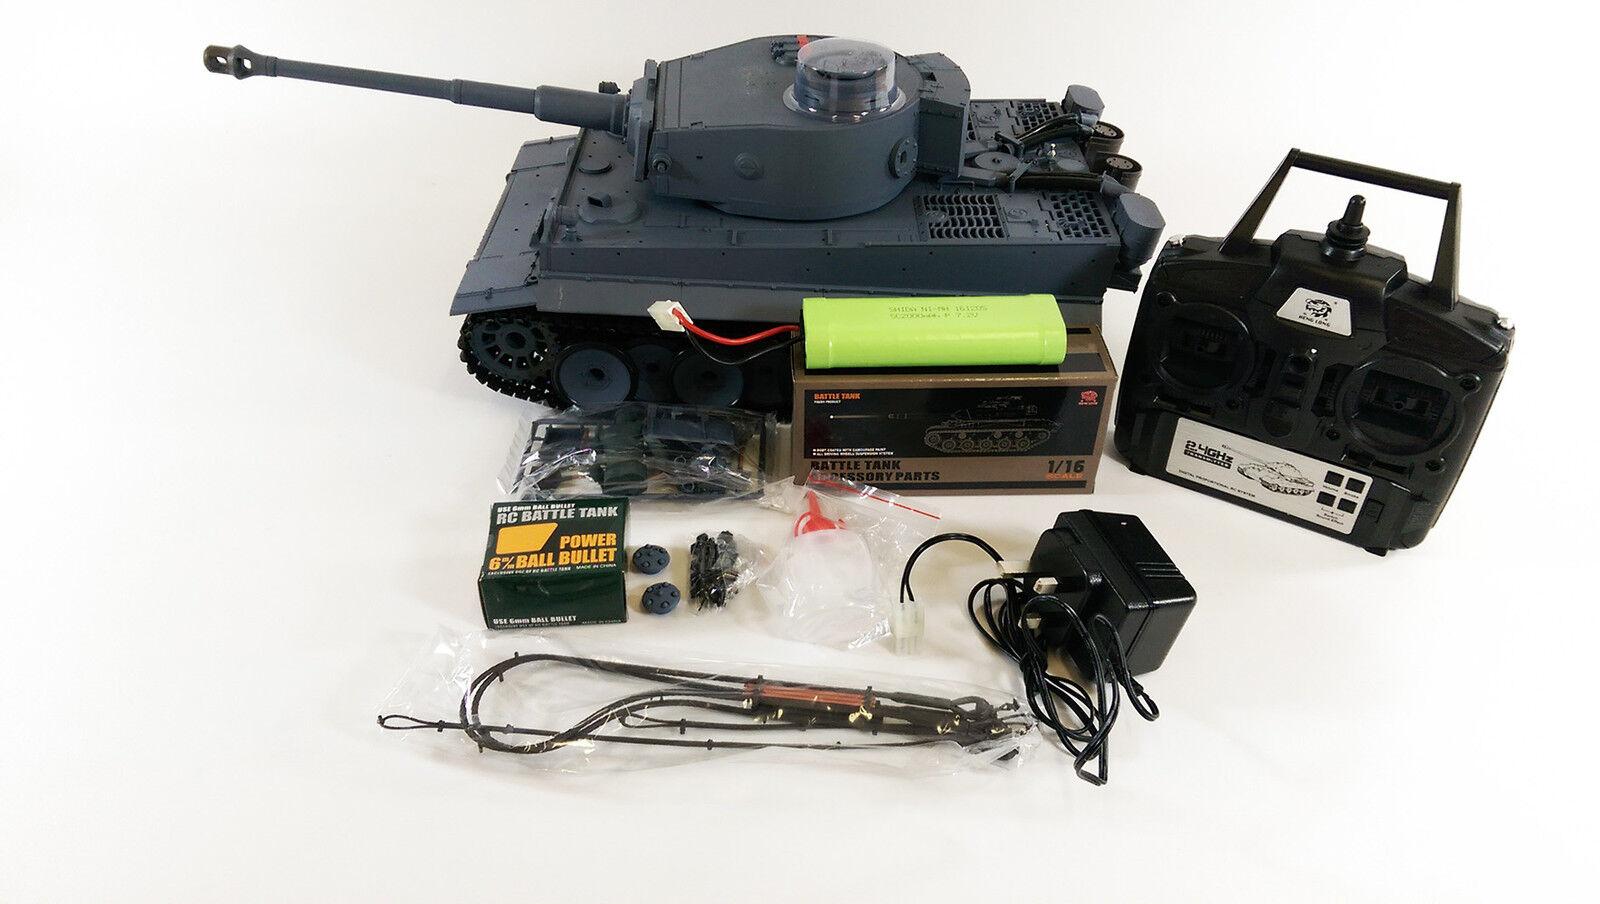 2.4ghz Heng Long 1 16 Tiger 1 FUMO German SUONO radiocomando ESERCITO GUERRA CARRO ARMATO